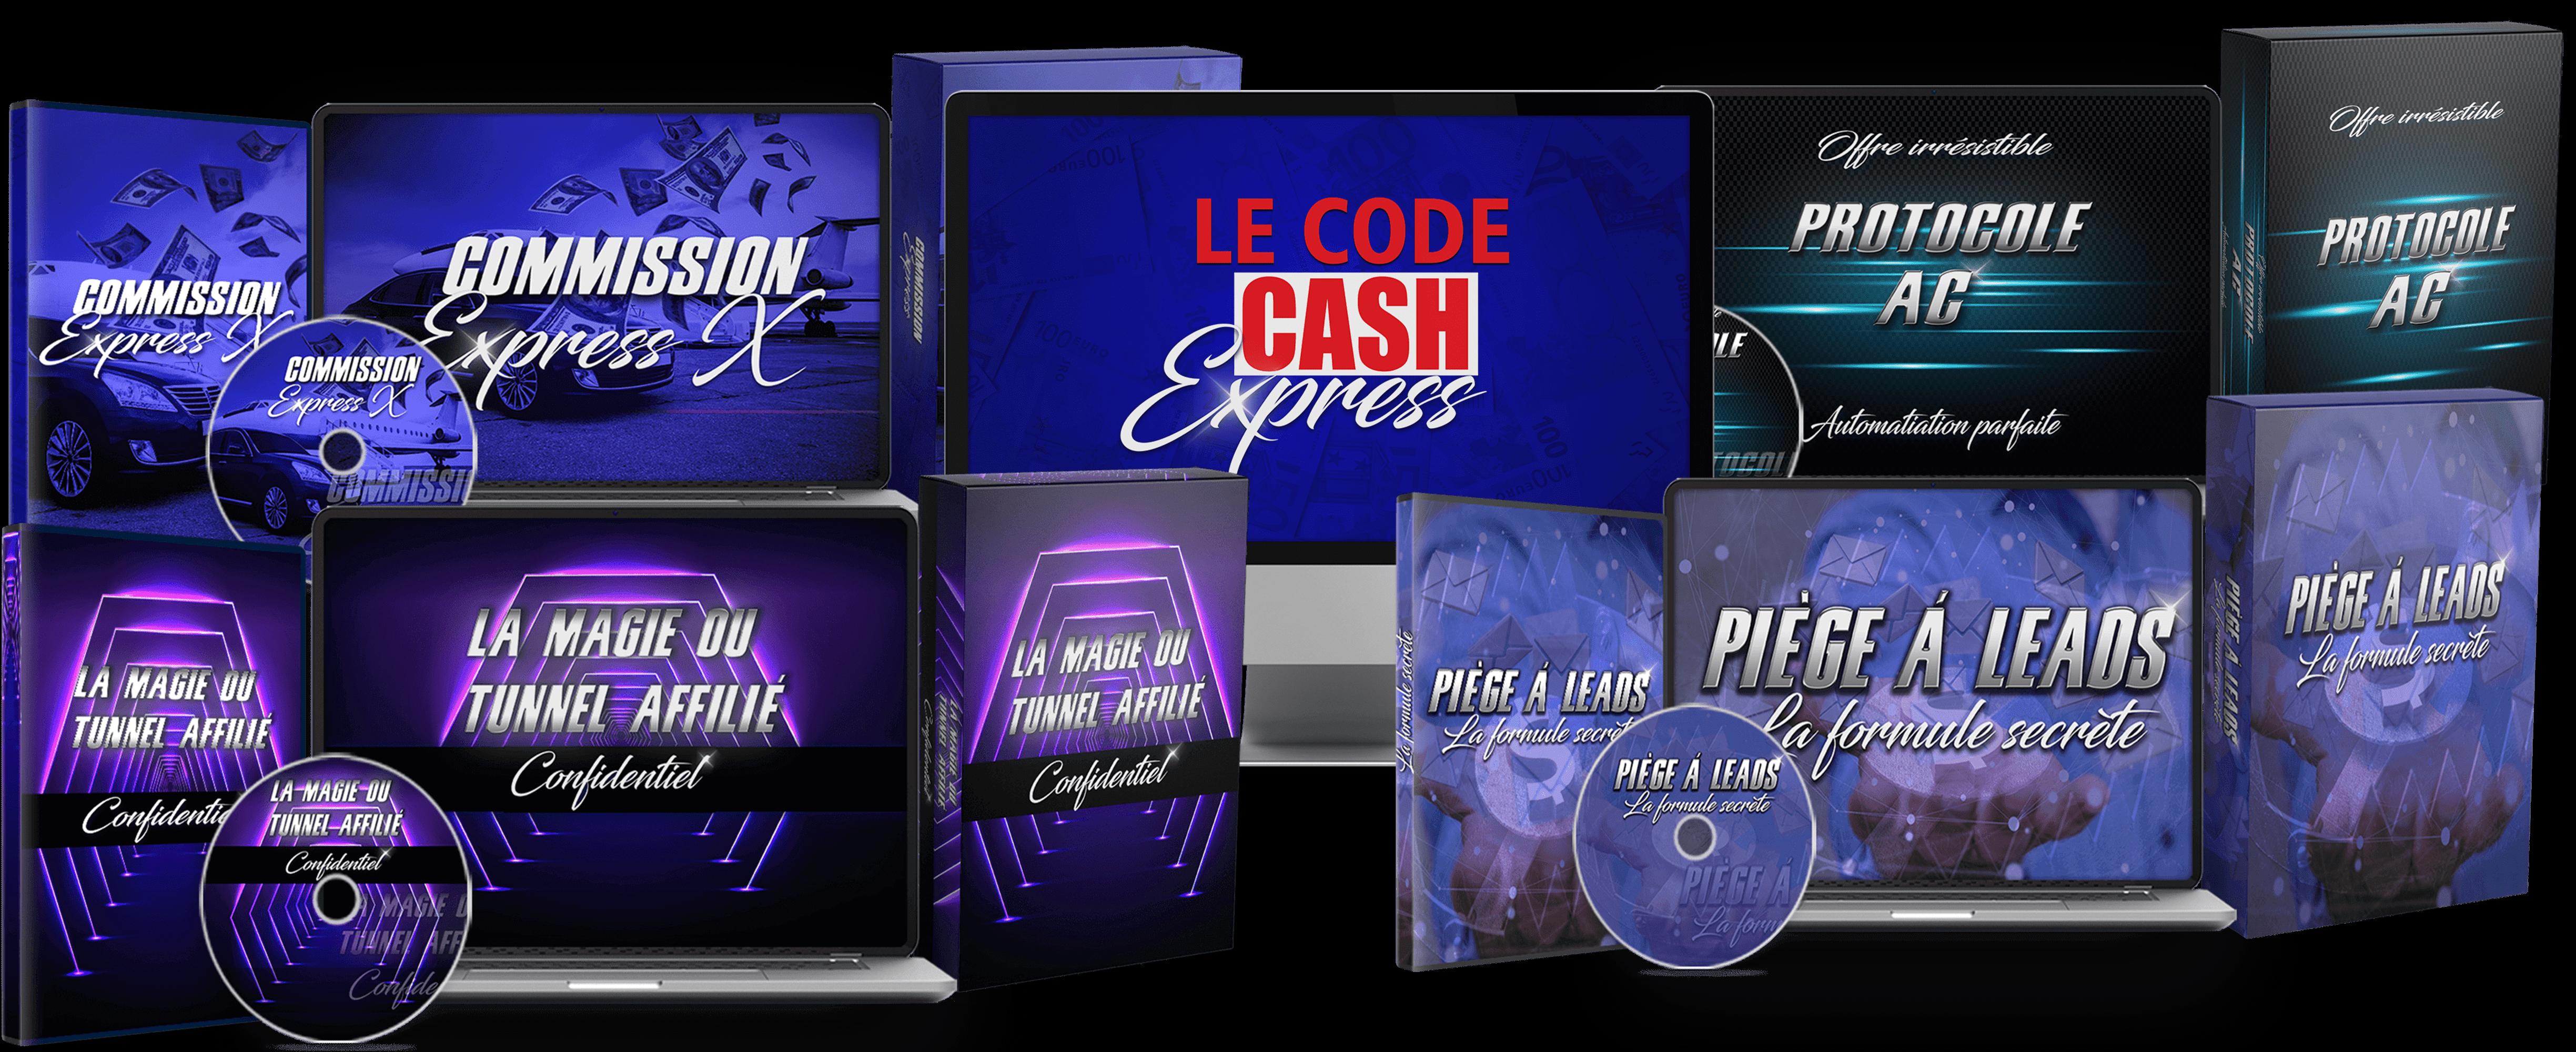 Le programme code cash express avis final